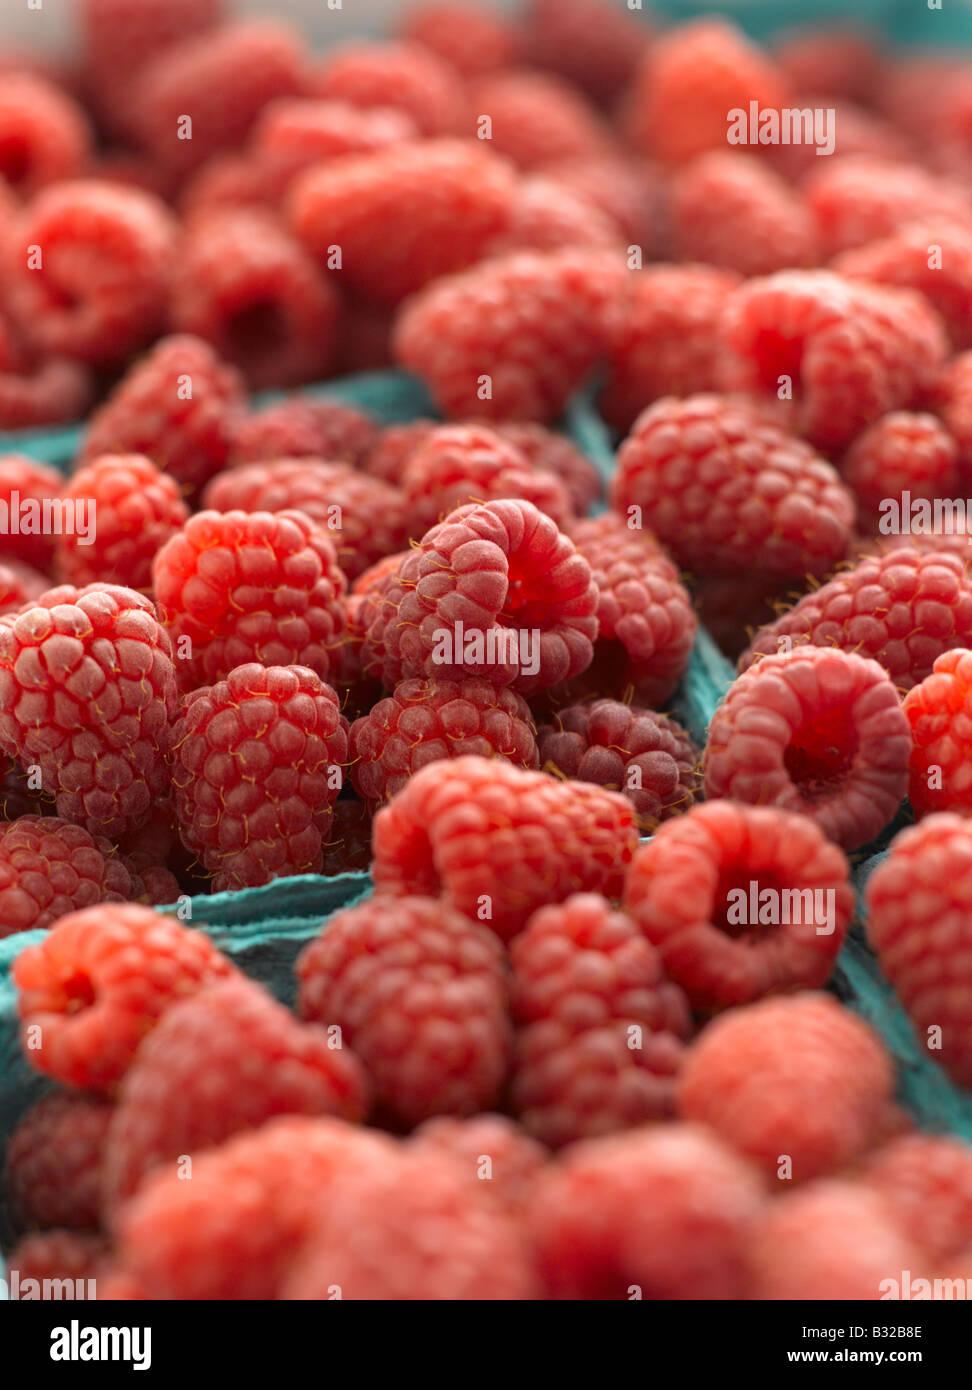 Fresh red raspberries in baskets - Stock Image